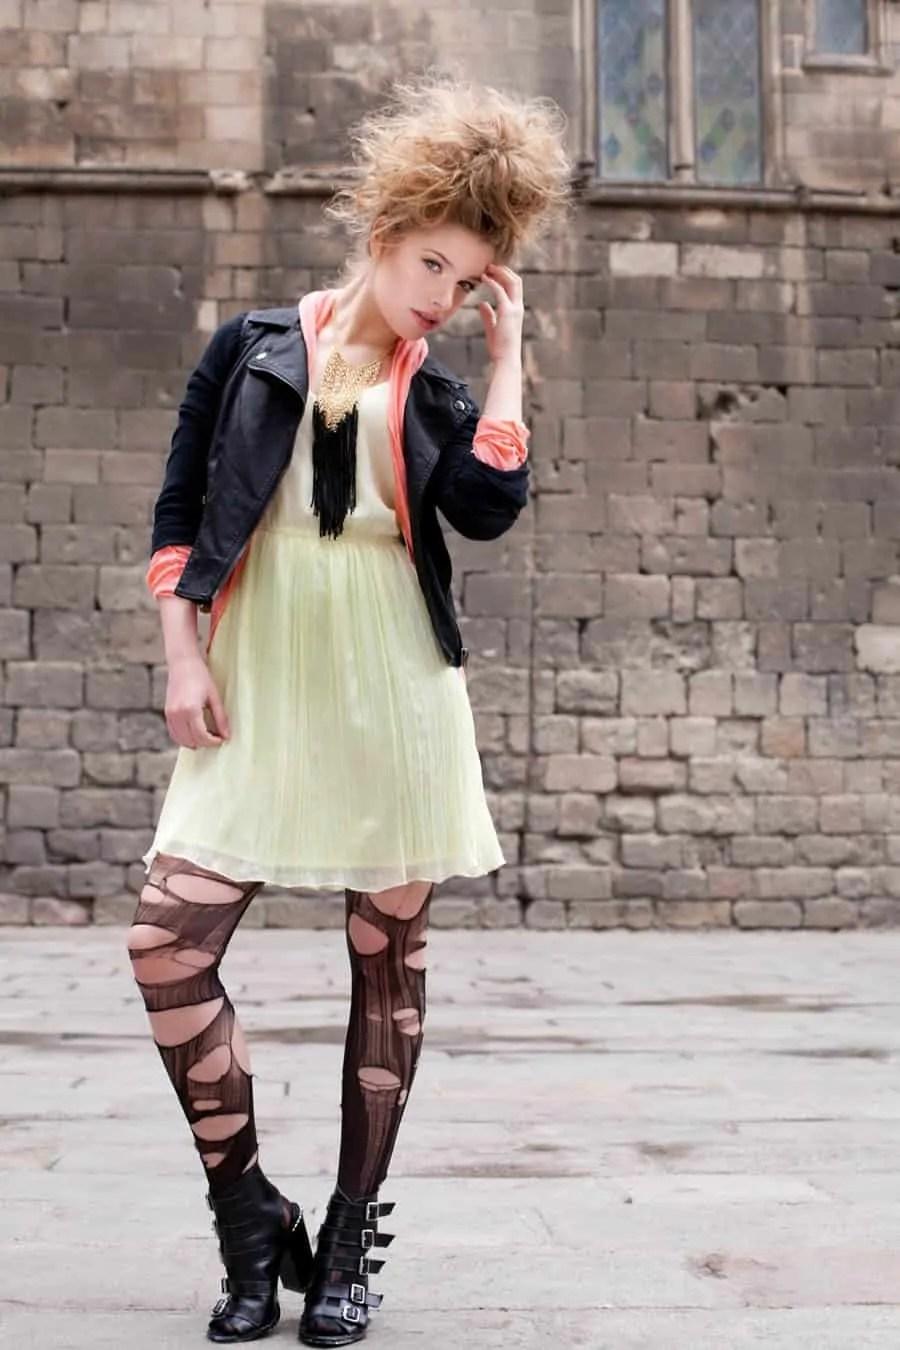 street_fashion_ii_by_malize-d57wvzx 1